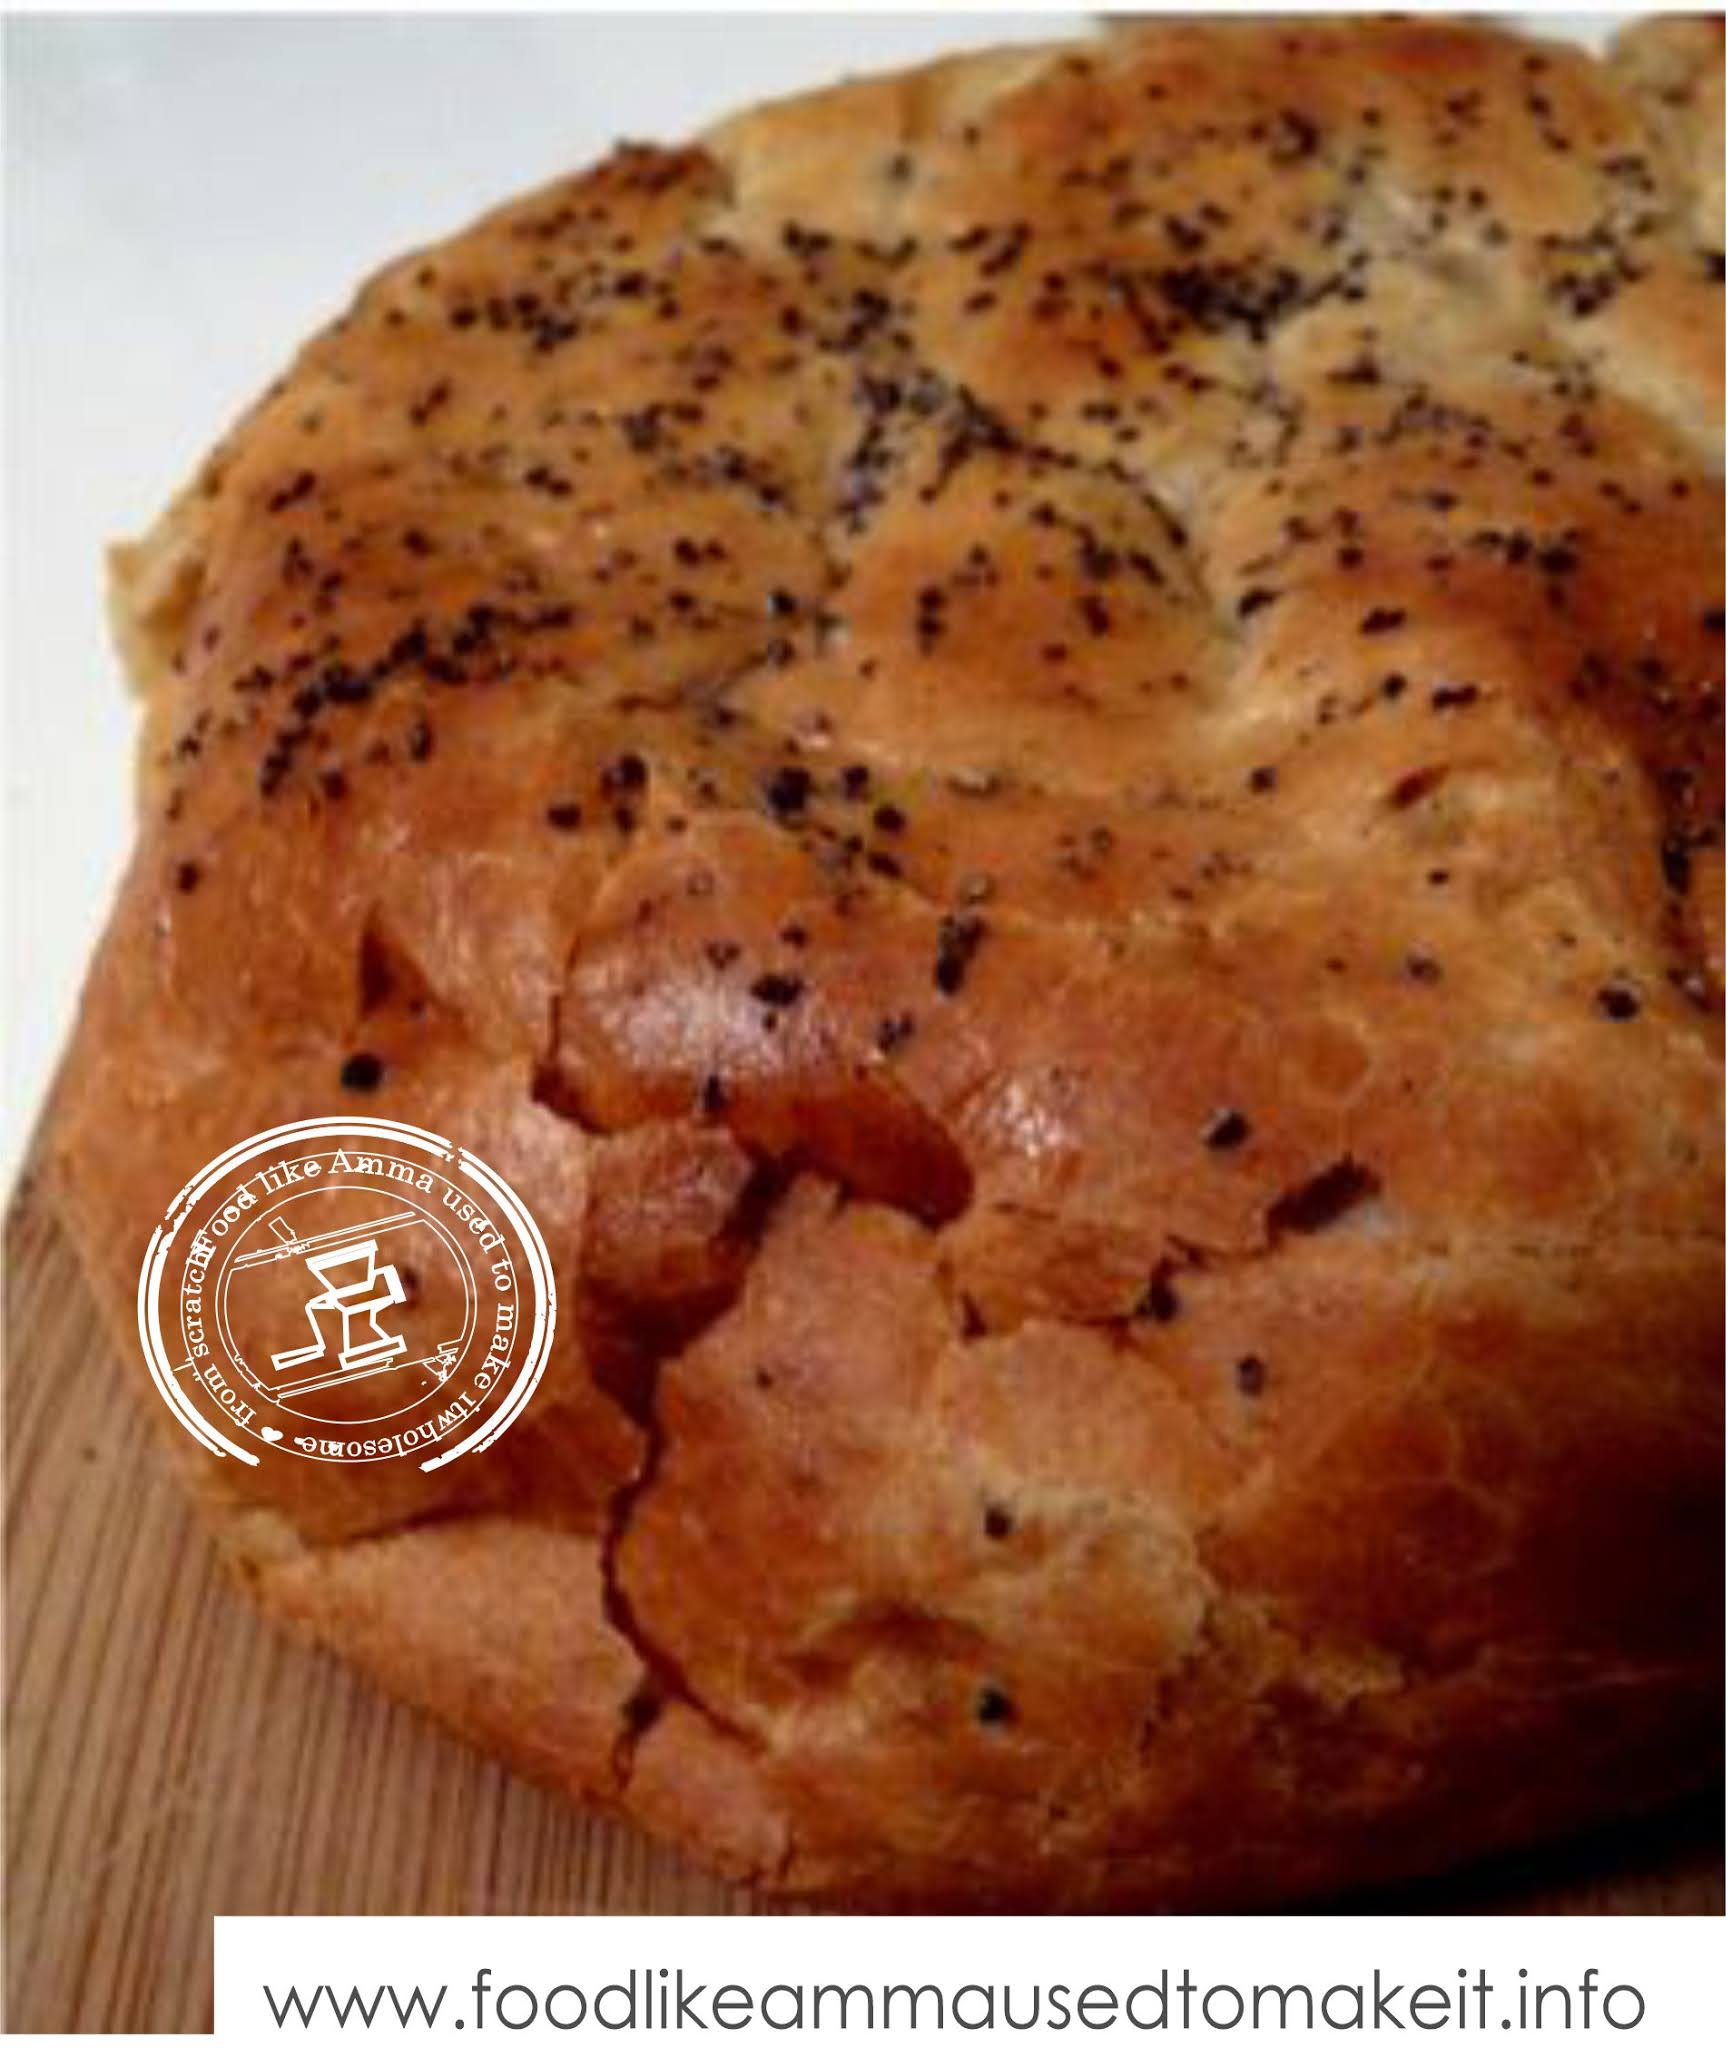 Durban Naan Bread